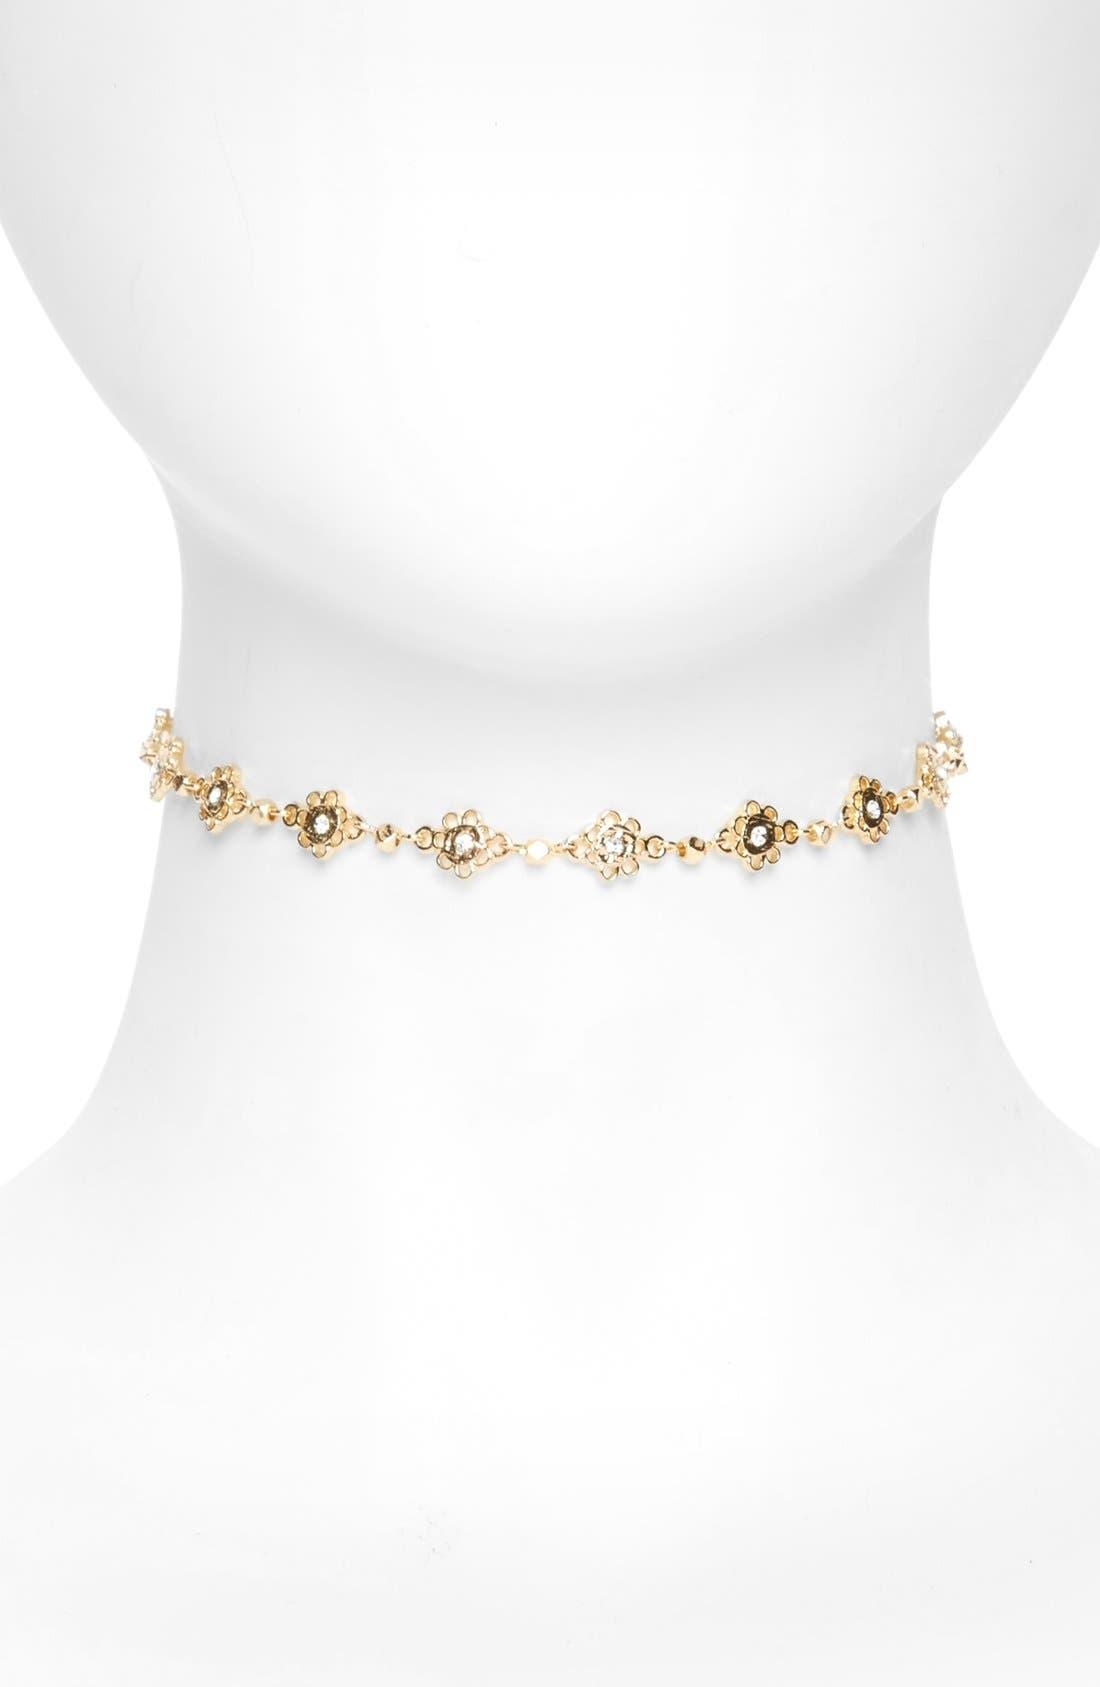 Alternate Image 1 Selected - BP. Metal Flower Choker Necklace